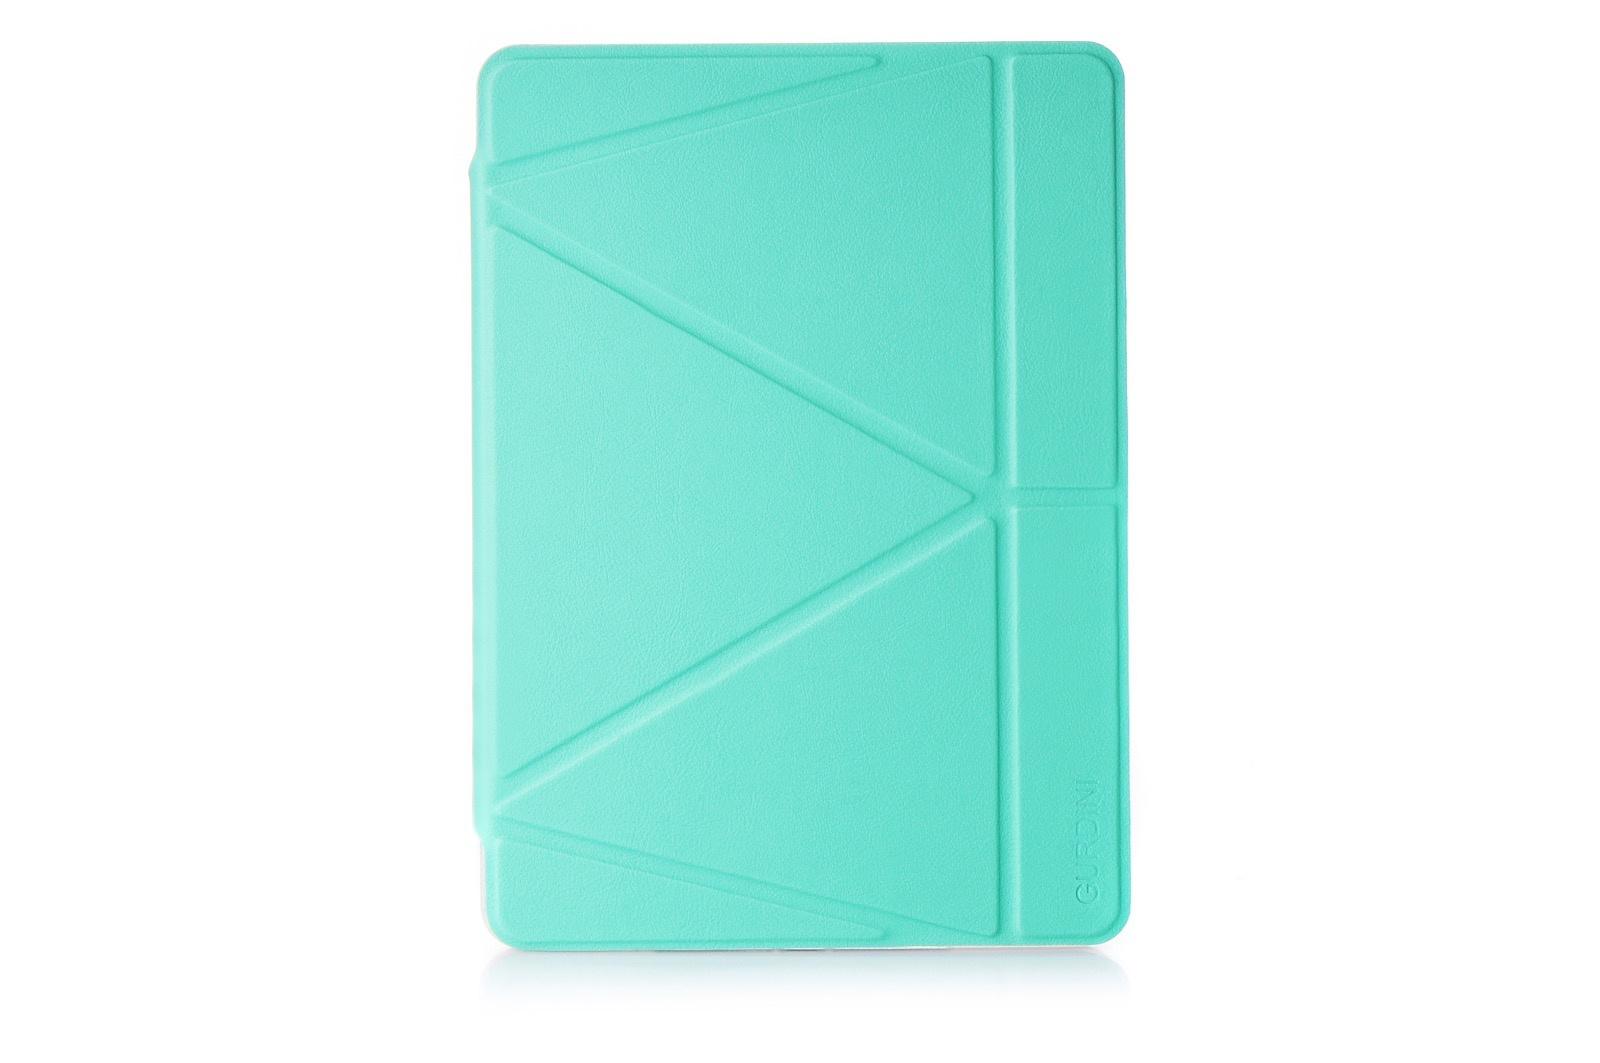 "Чехол для планшета Gurdini Lights Series 410337 для Apple Ipad mini 4 7.9"", 410337, бирюзовый"